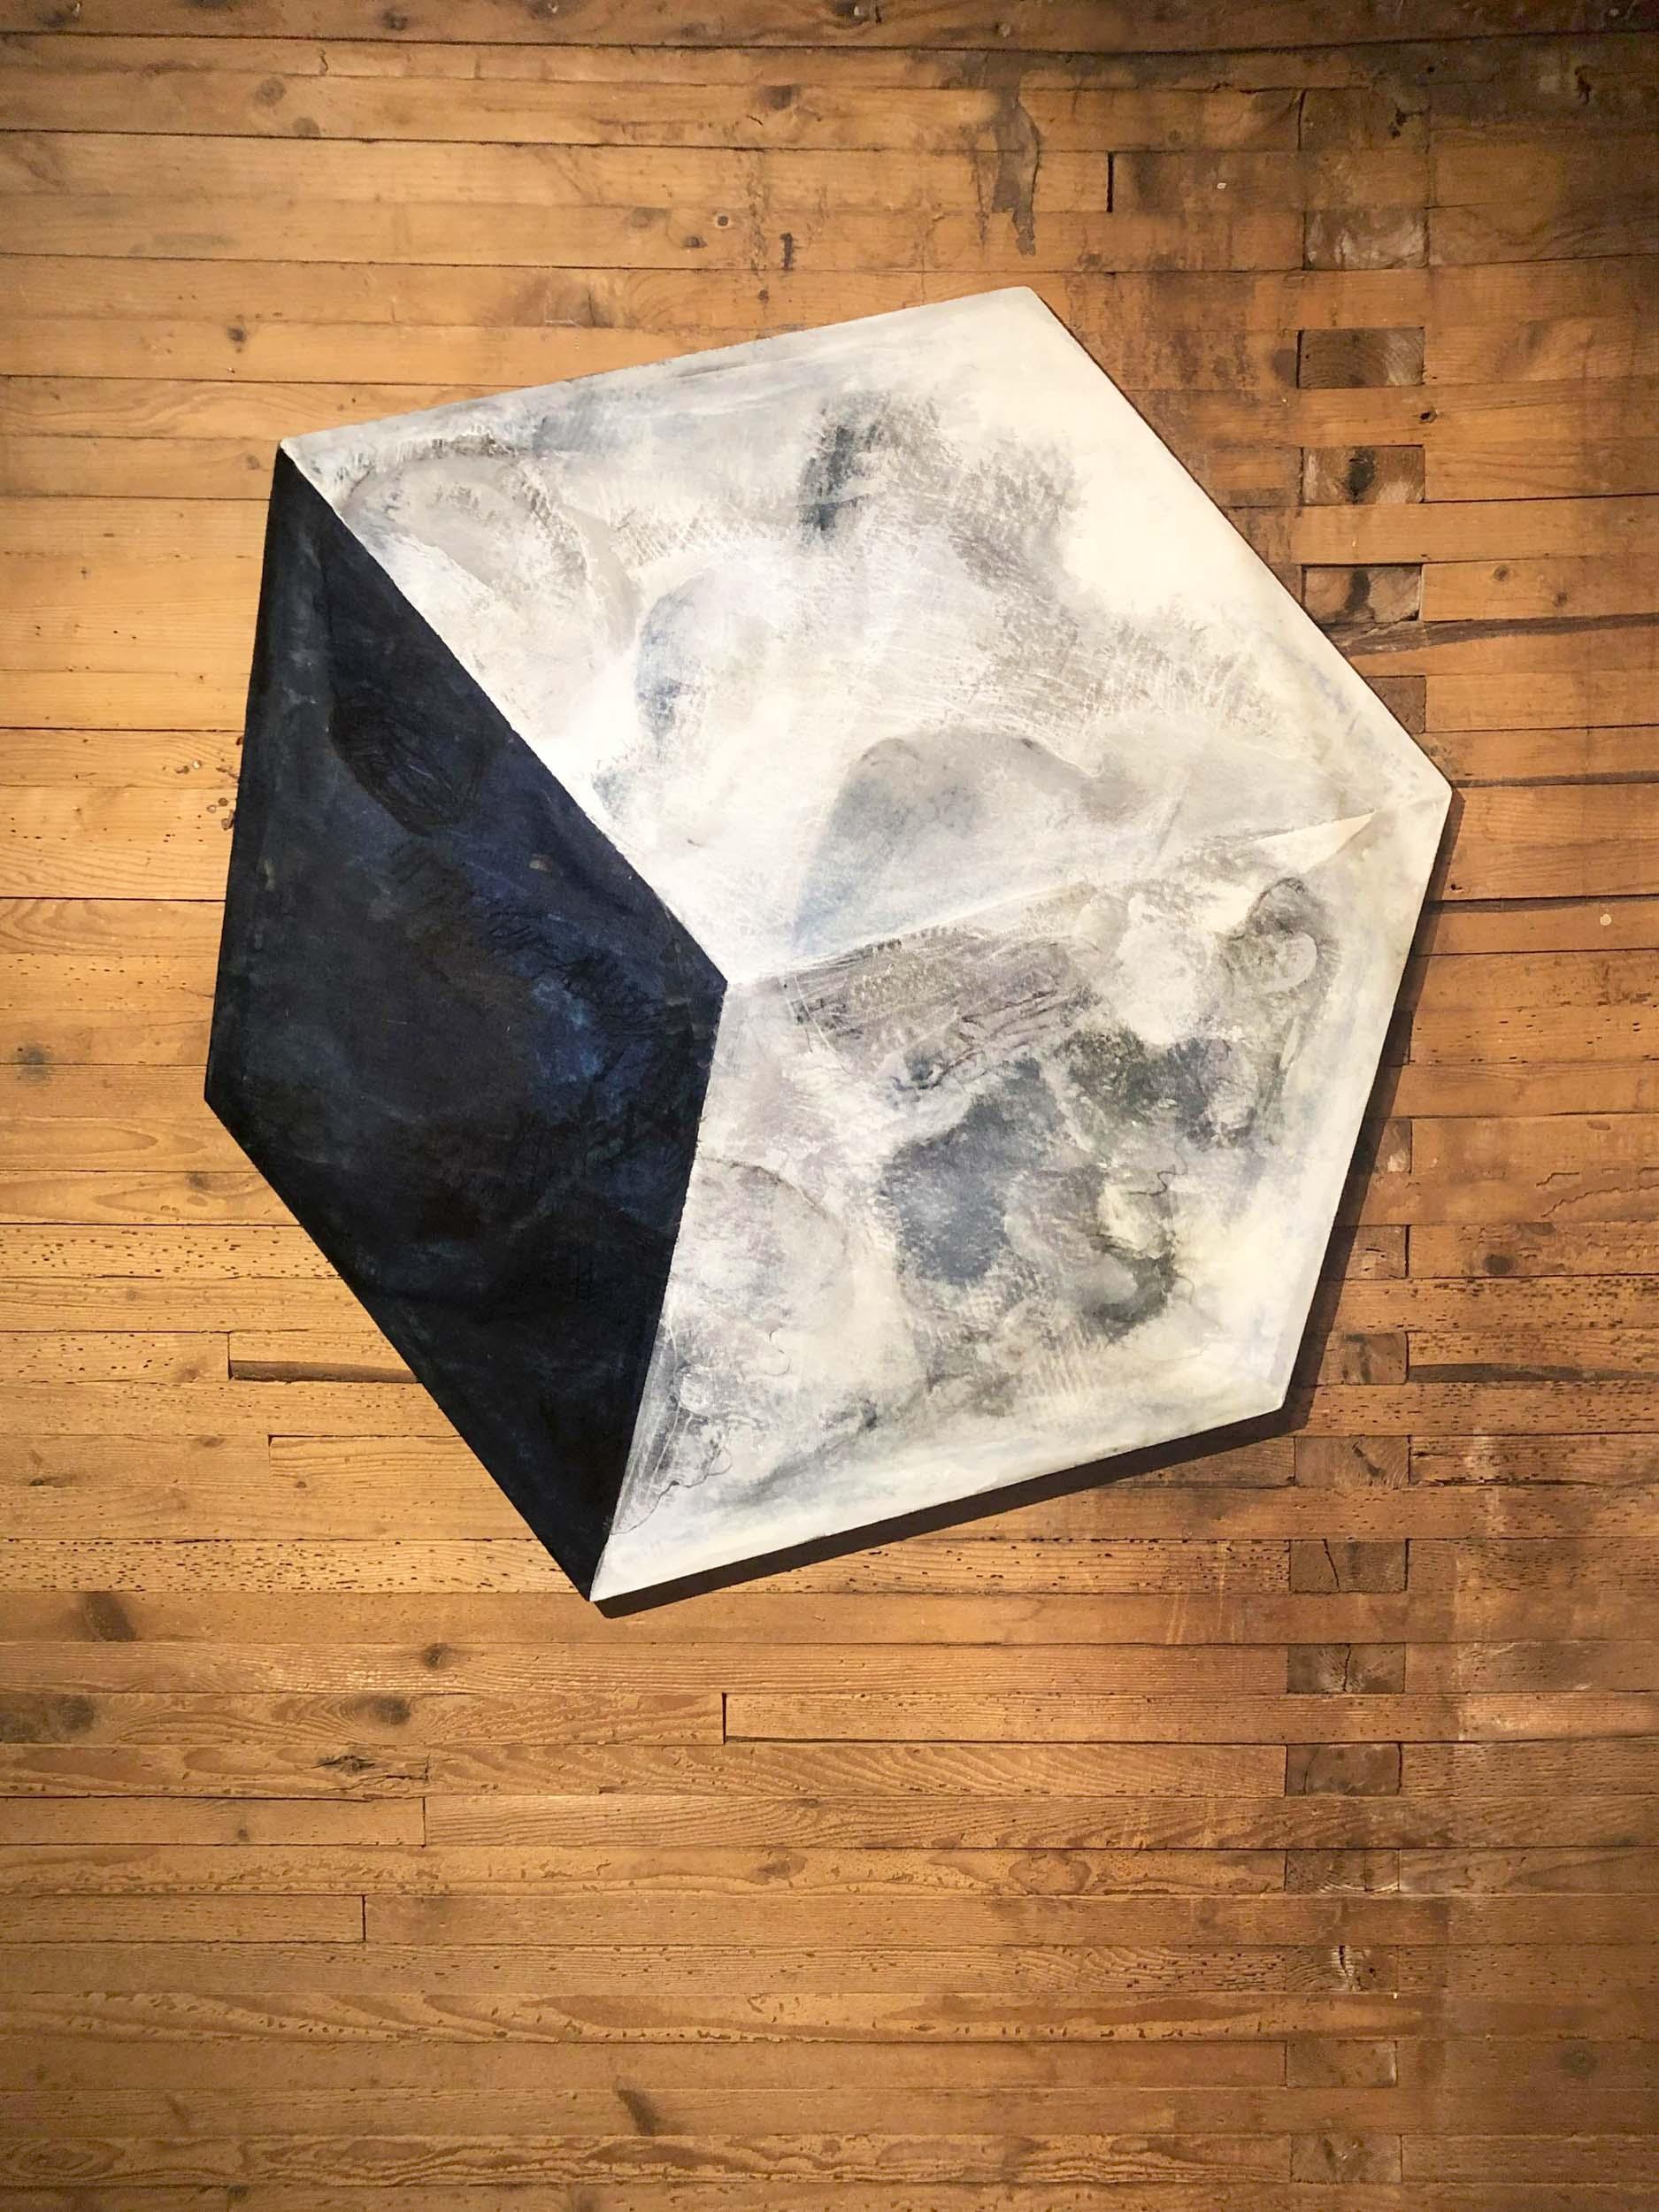 wassaic-project-artist-daniel-zeese-cube-moon-2019-01-06-20-41-21.jpg